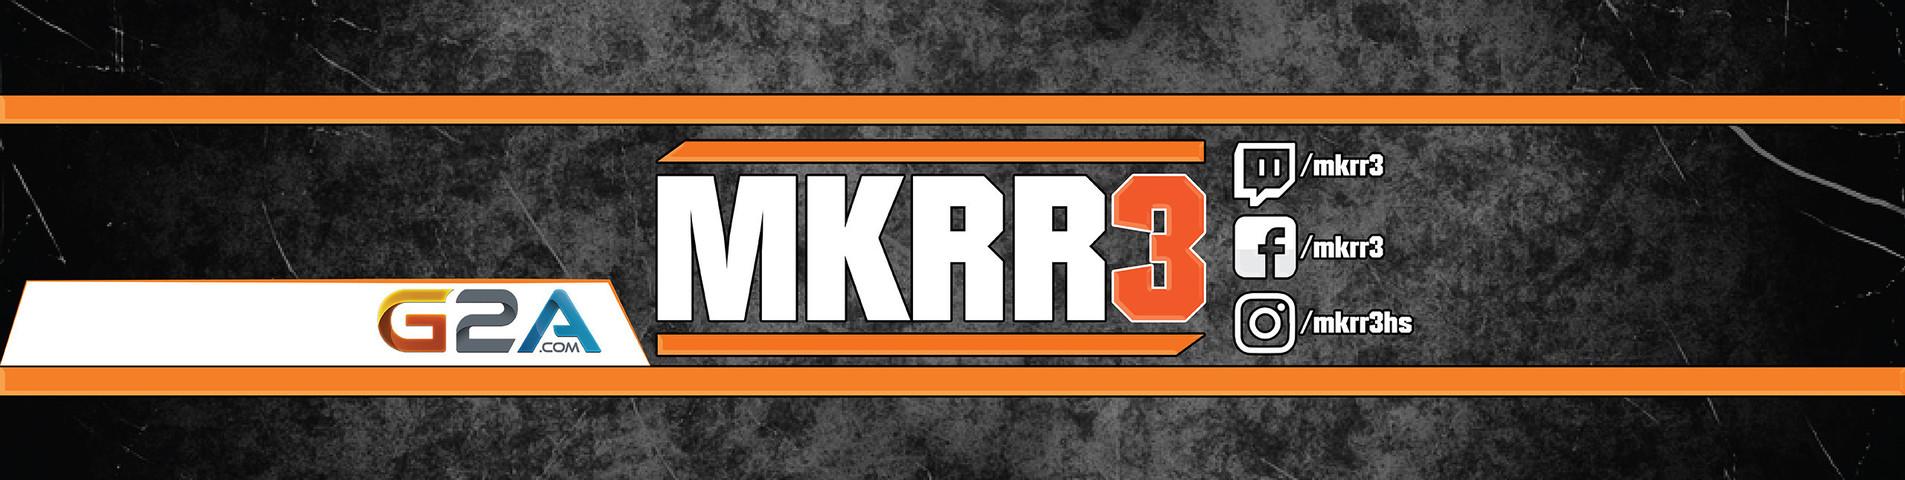 MkRR3